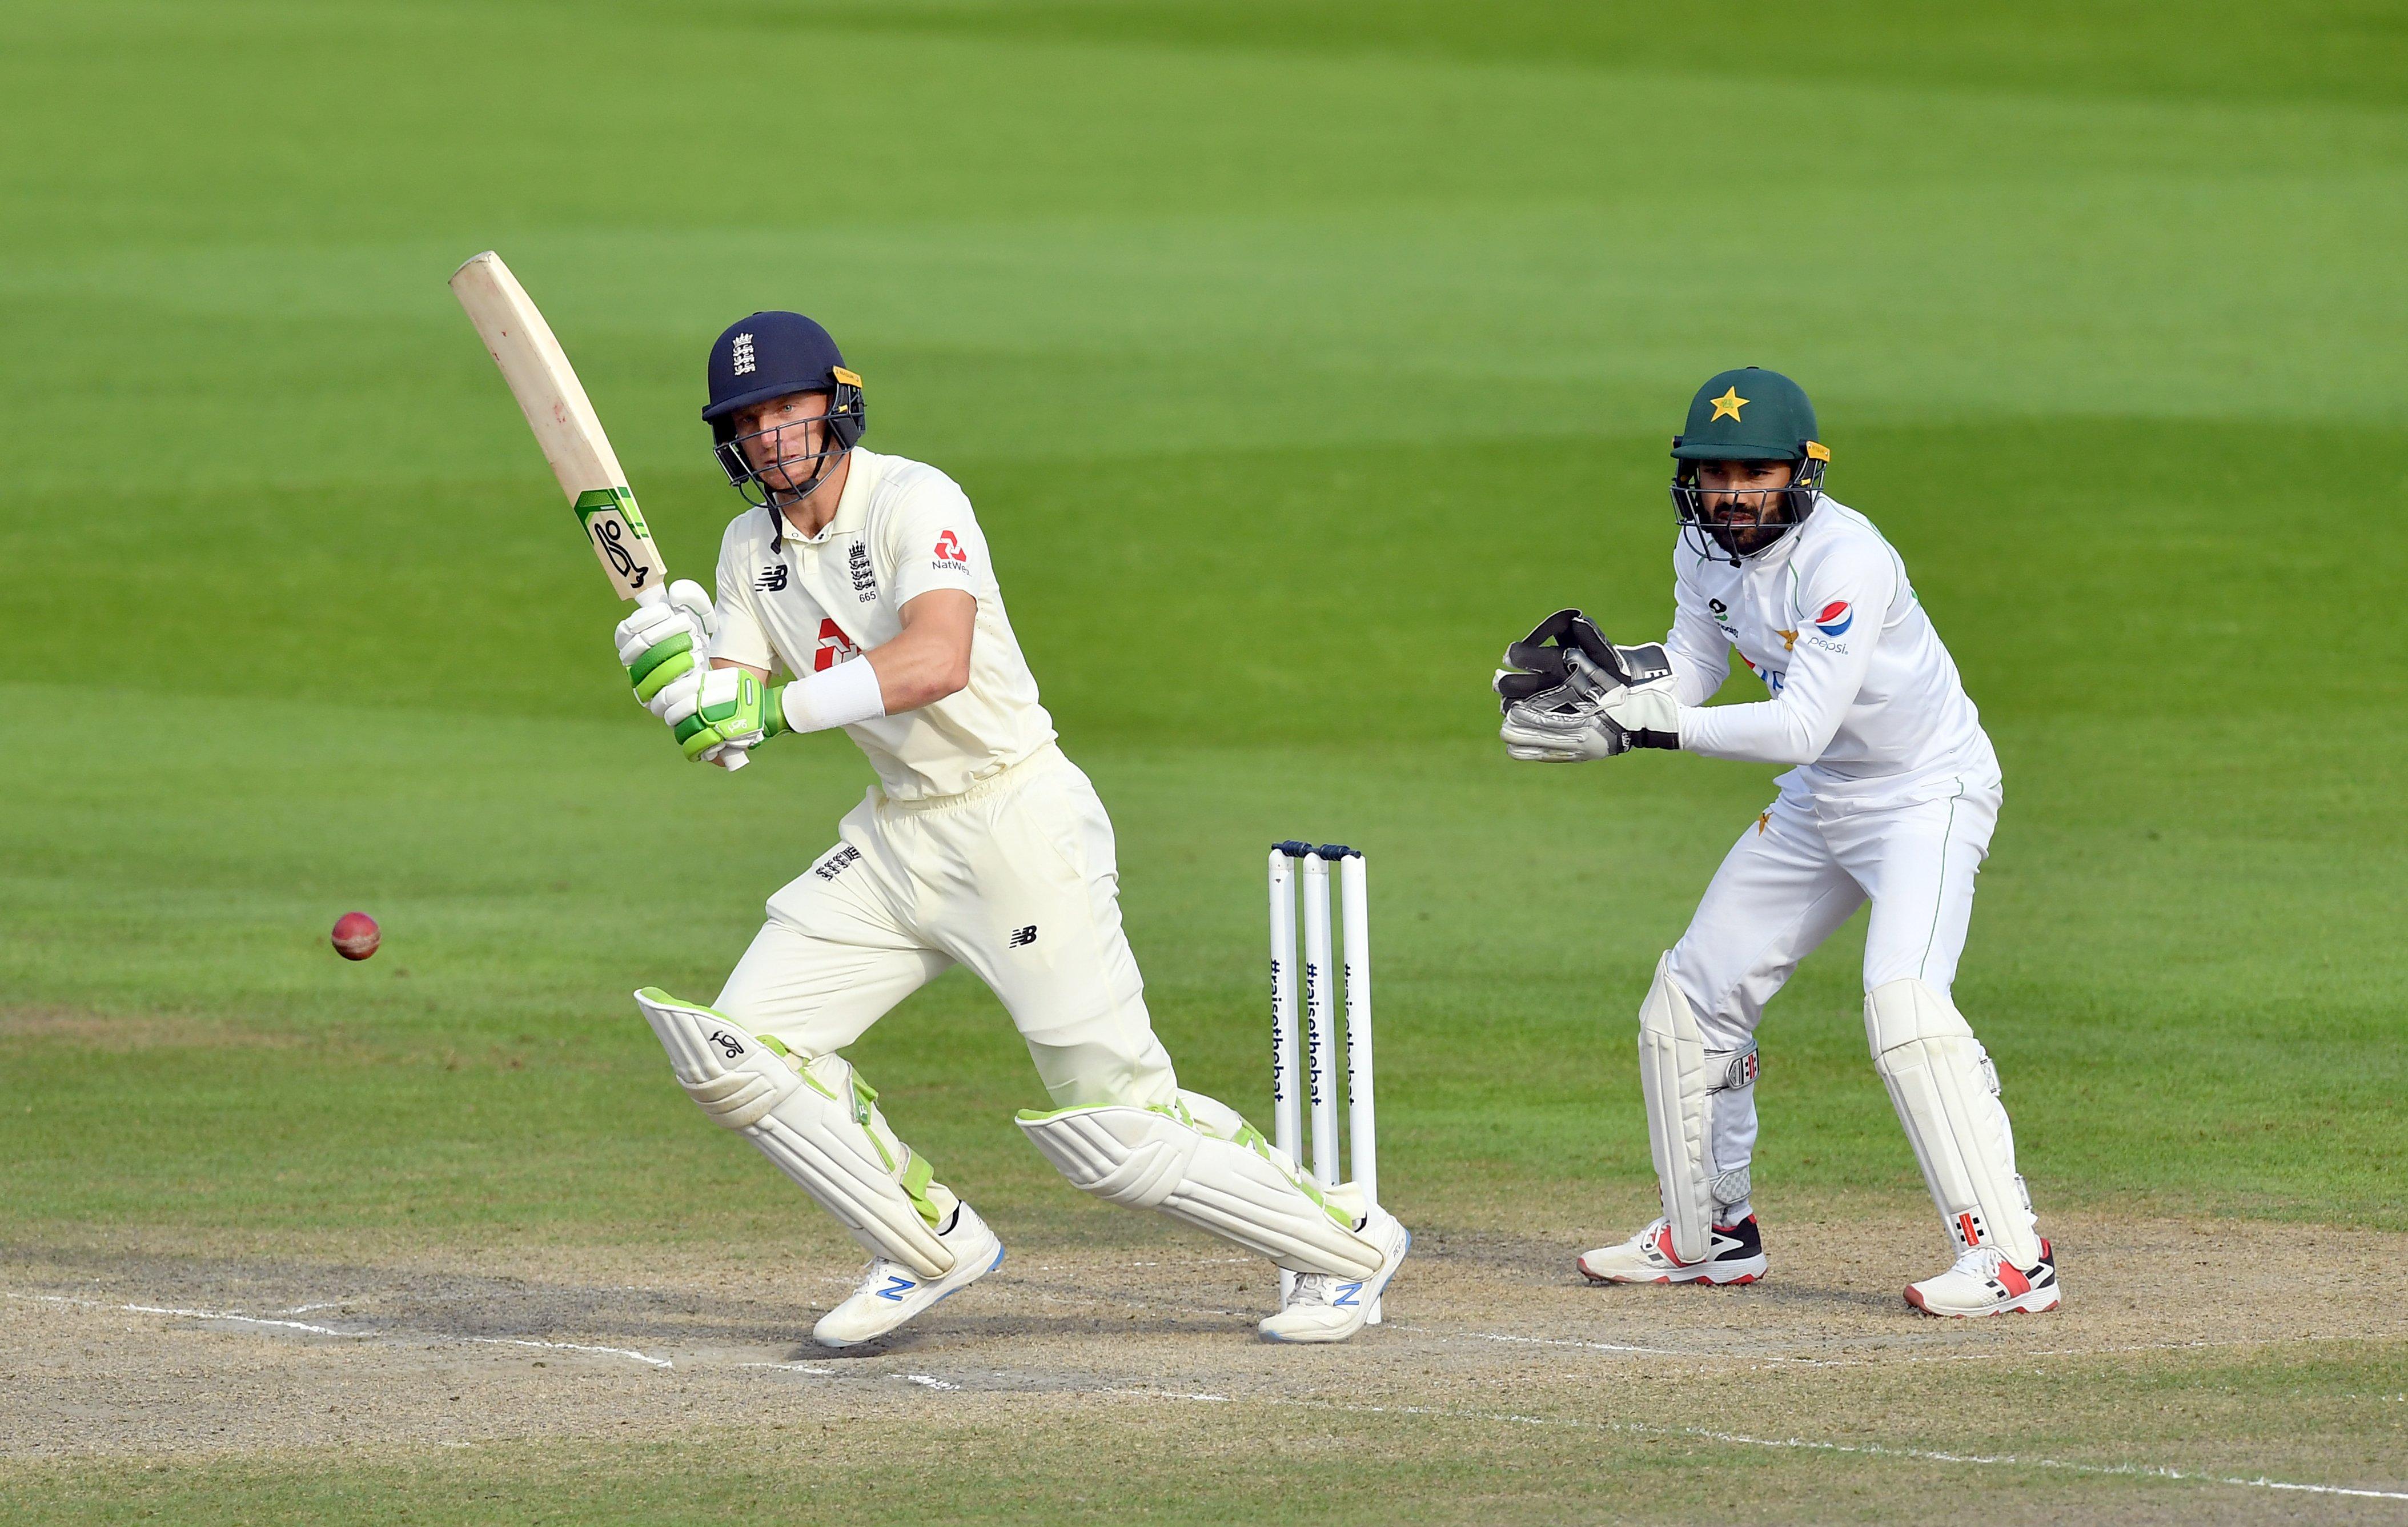 'I owed the team' – Jos Buttler relieved after sparking England comeback